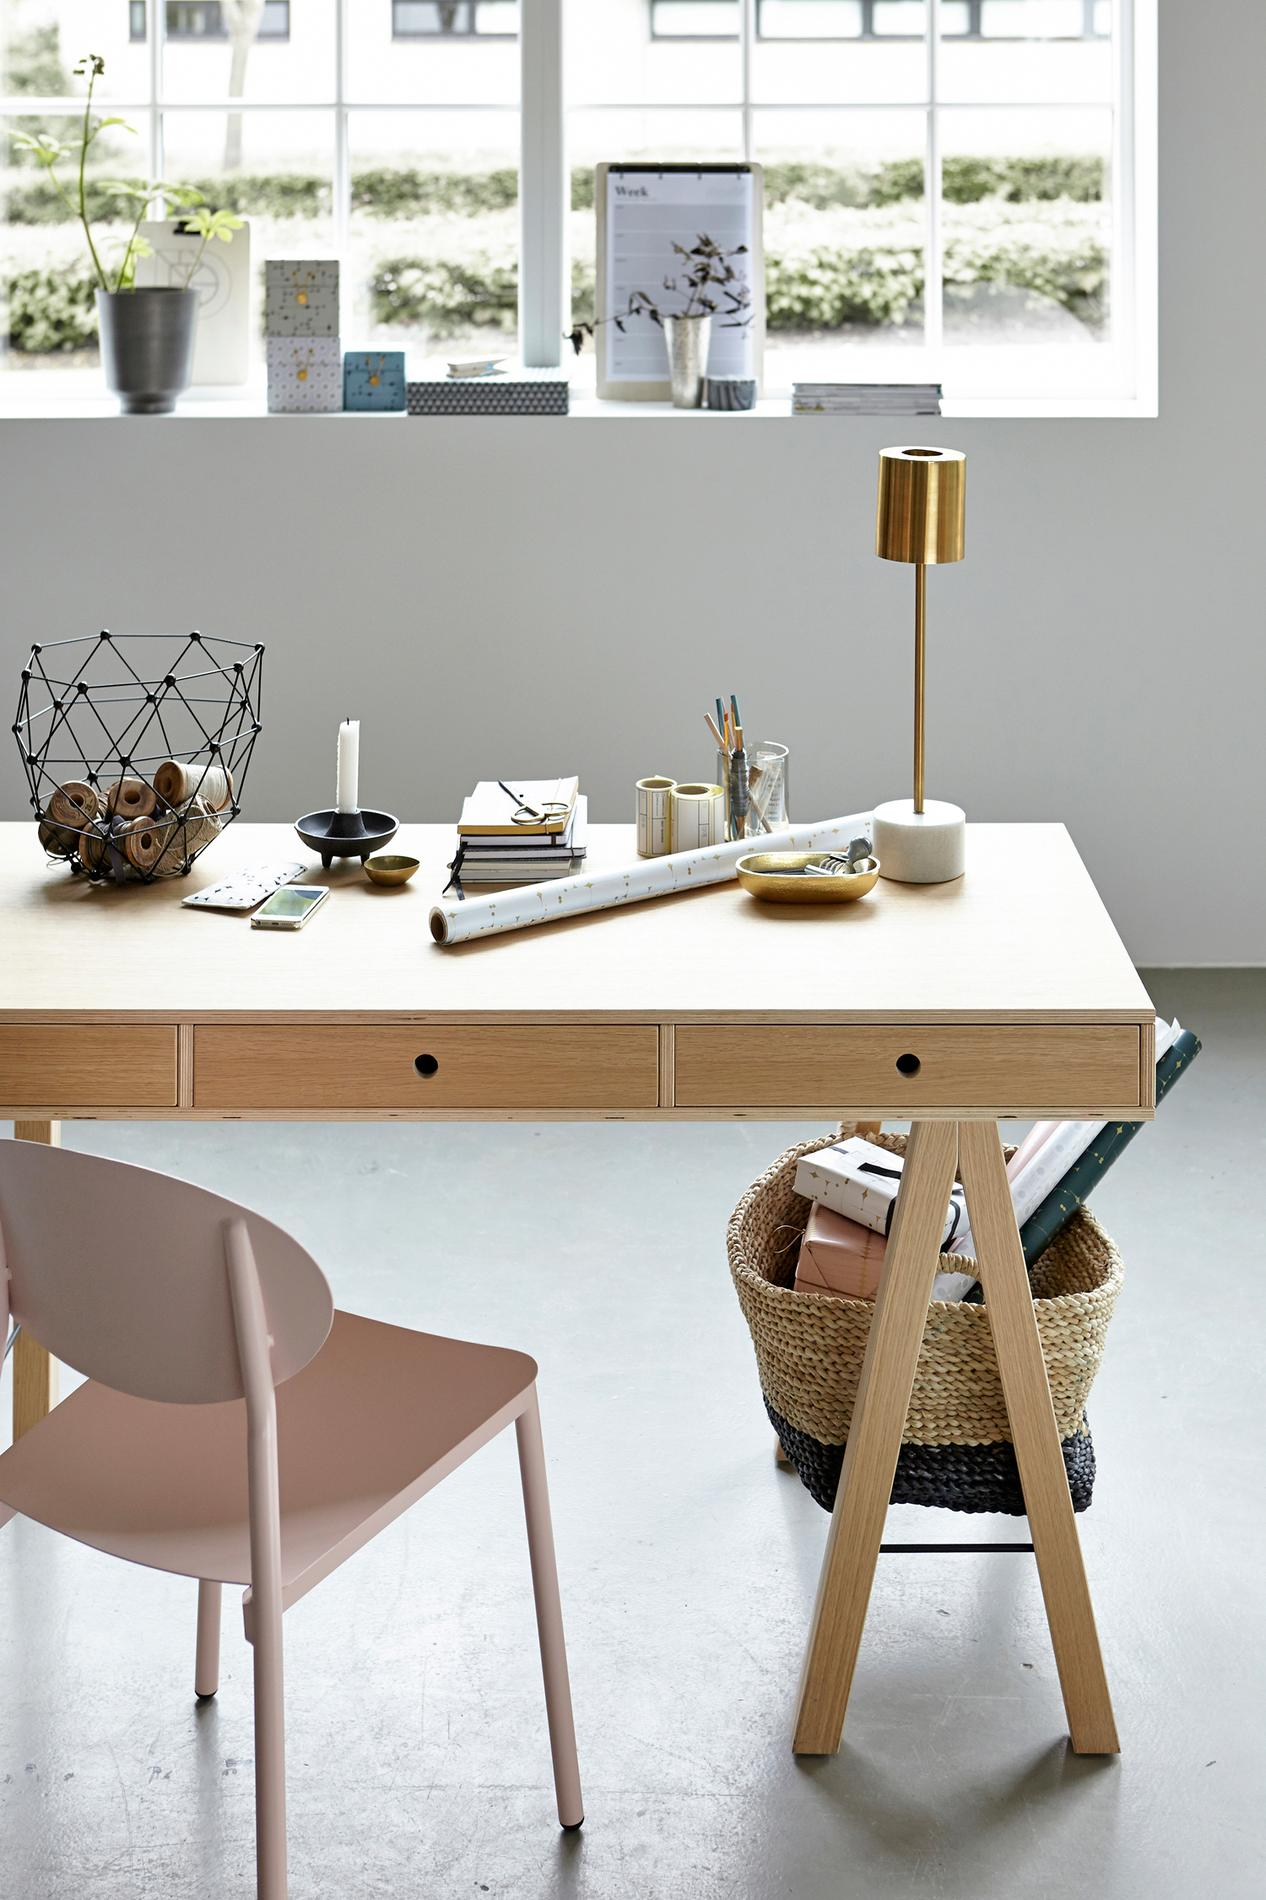 cinq bonnes raisons d assumer d tre bord lique madame. Black Bedroom Furniture Sets. Home Design Ideas